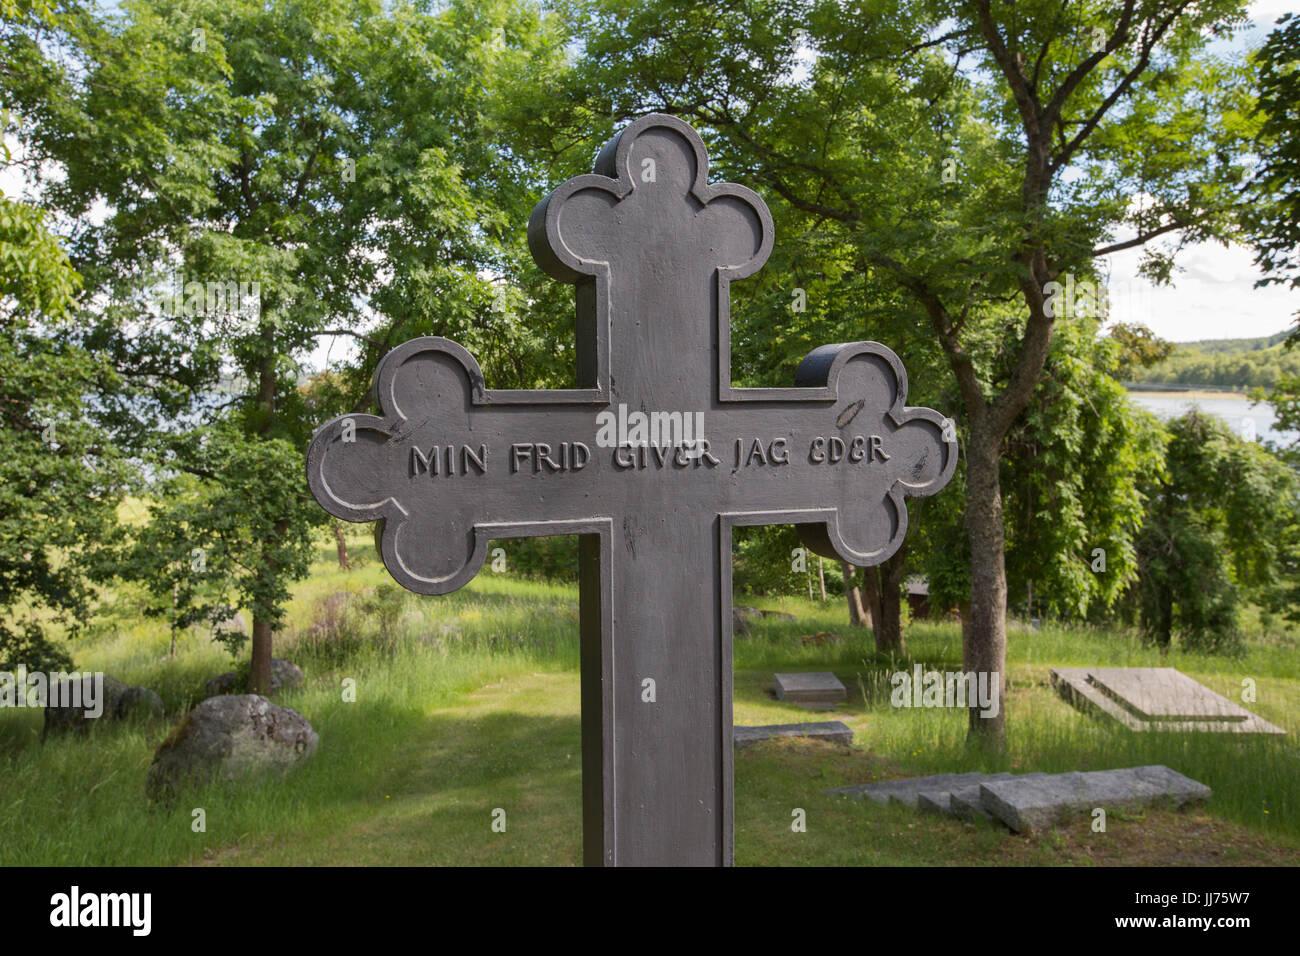 Wallenberg's mausoleum is the genus Wallenberg's burial site, Lindö, Stockholm, Sweden. - Stock Image